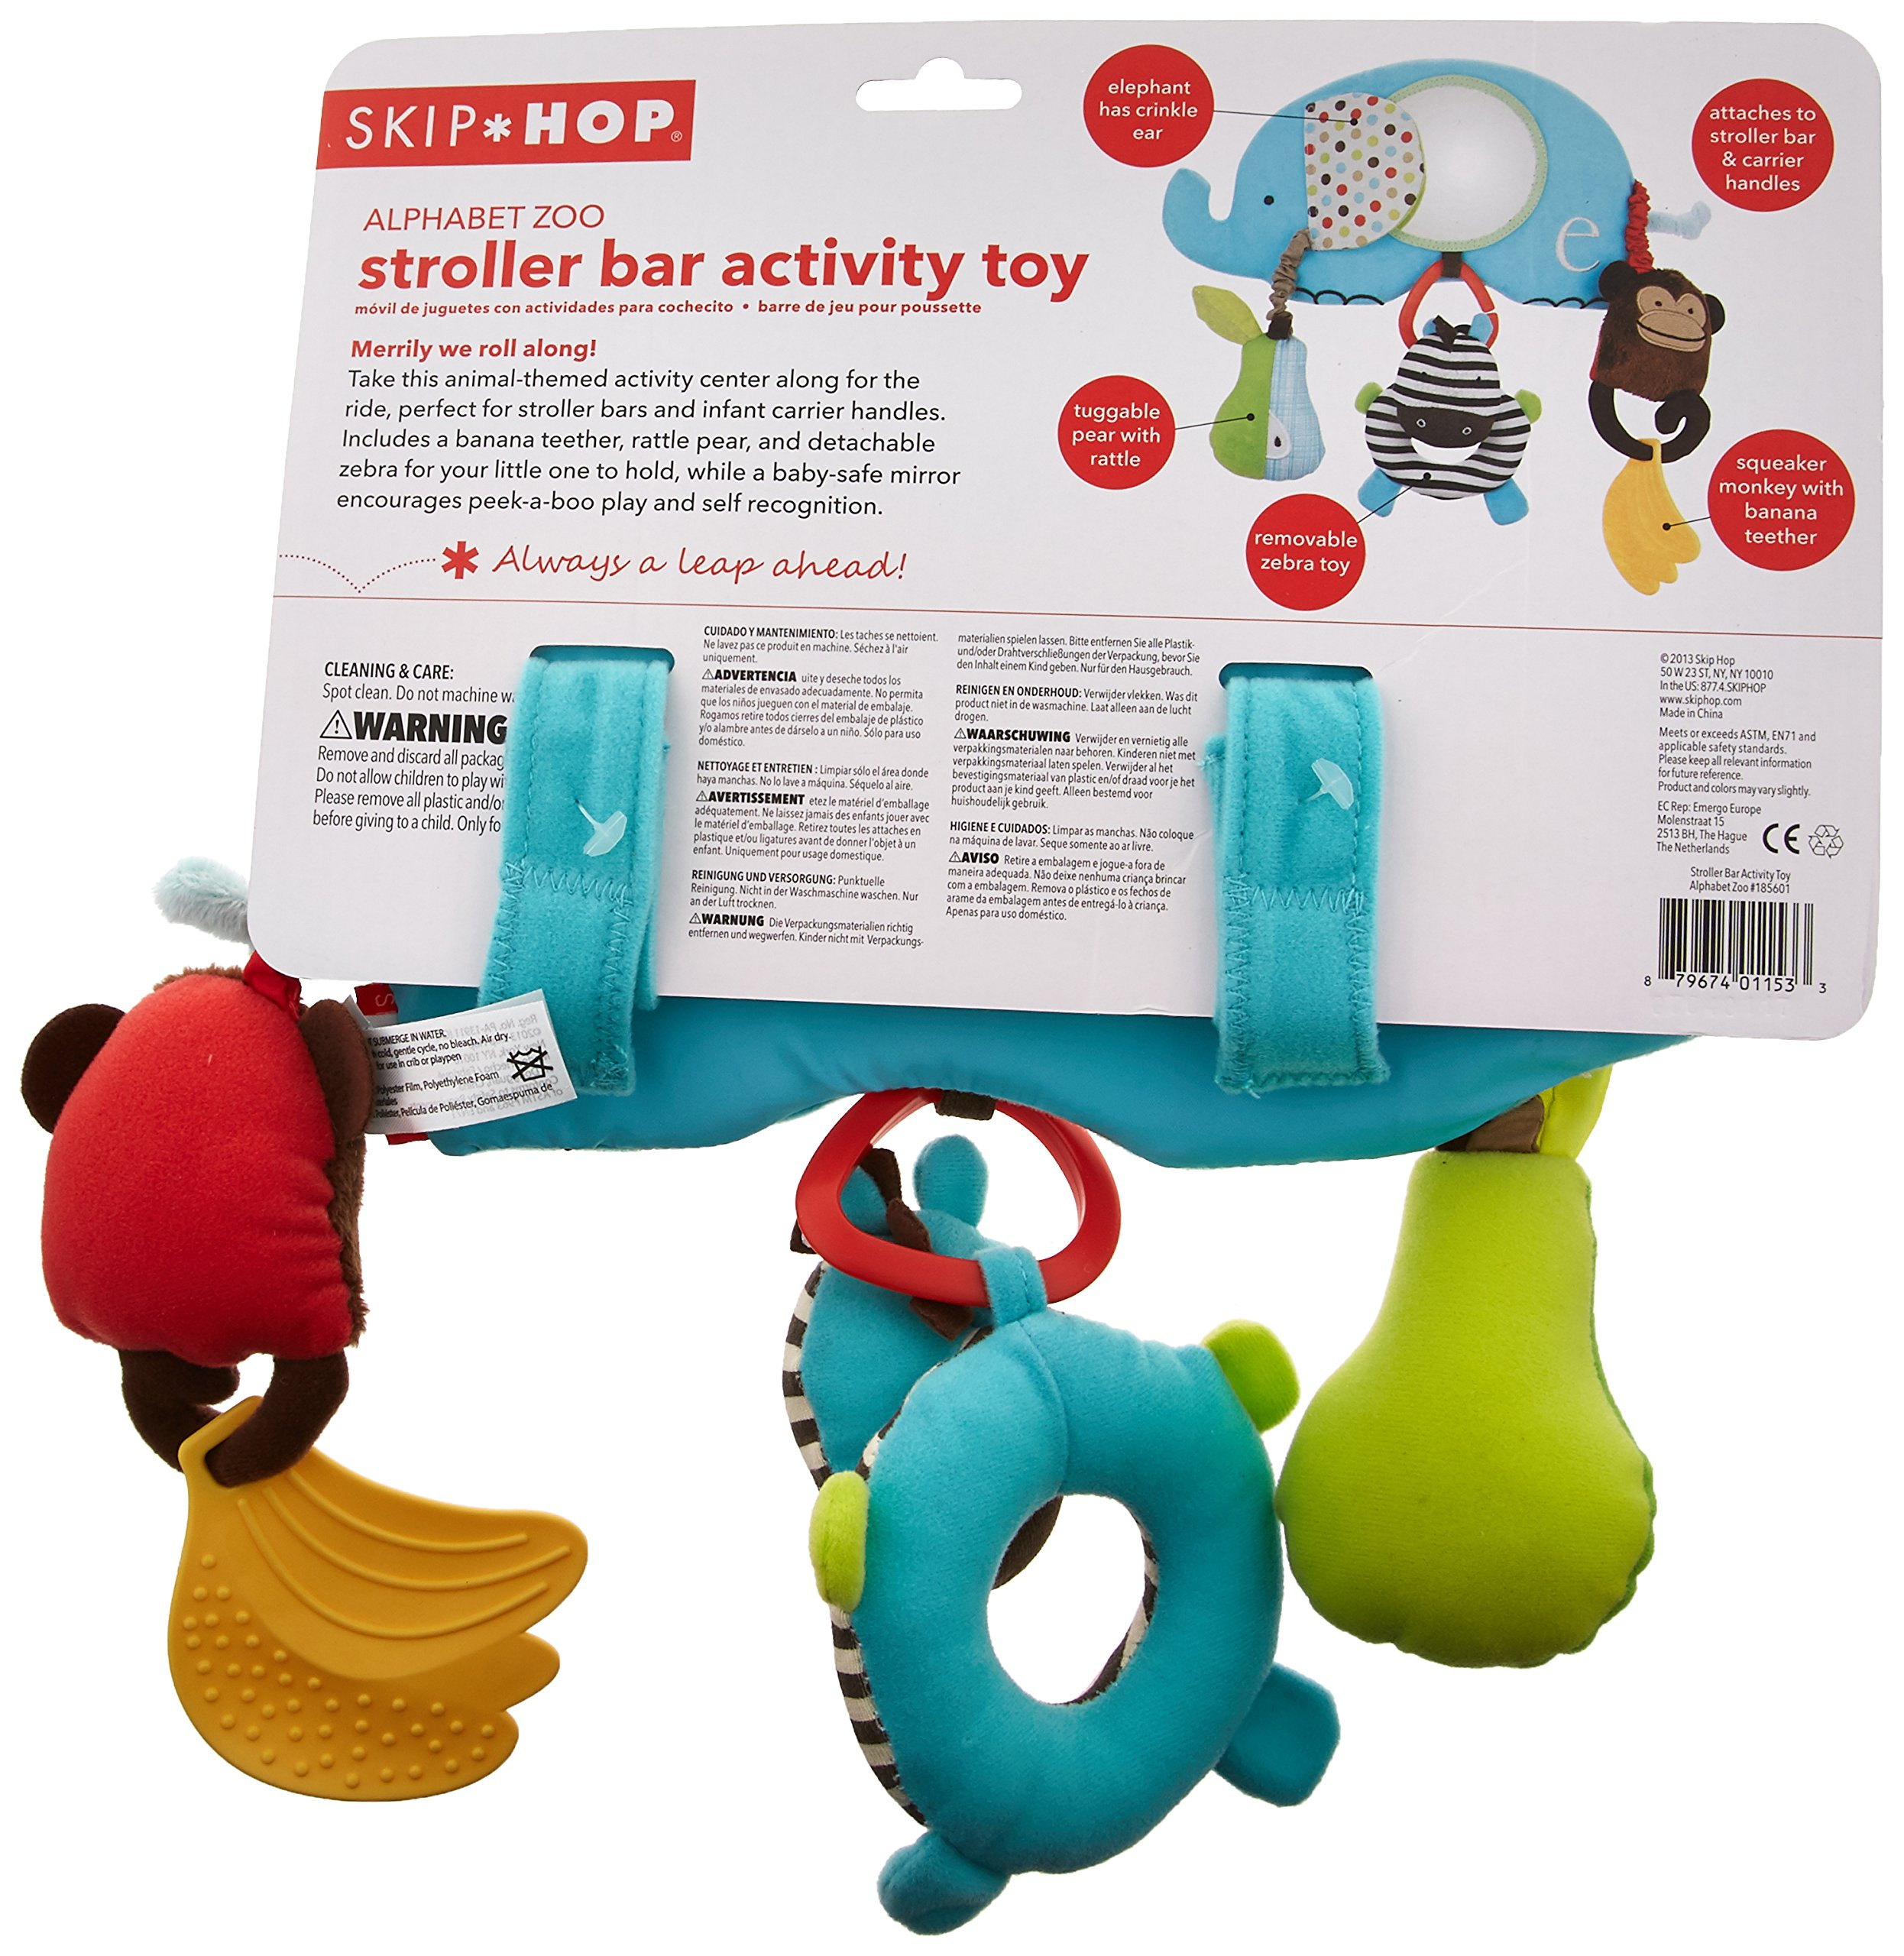 Skip Hop Alphabet Zoo Stroller Bar Activity Toy, Multi by Skip Hop (Image #3)